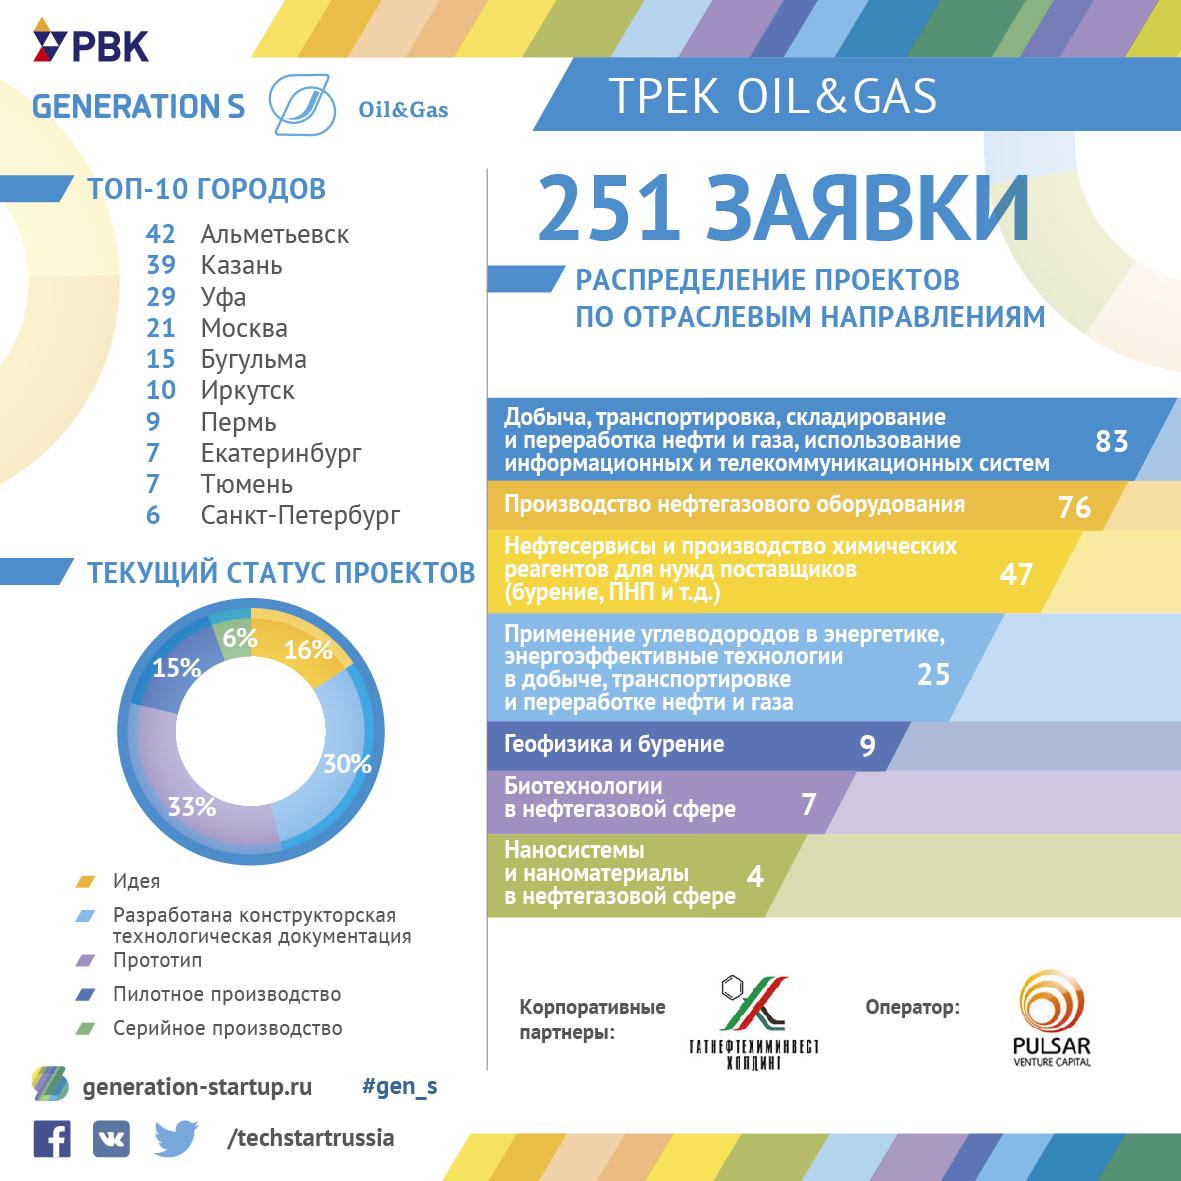 Gen_s_инфографика_4-01 (2)